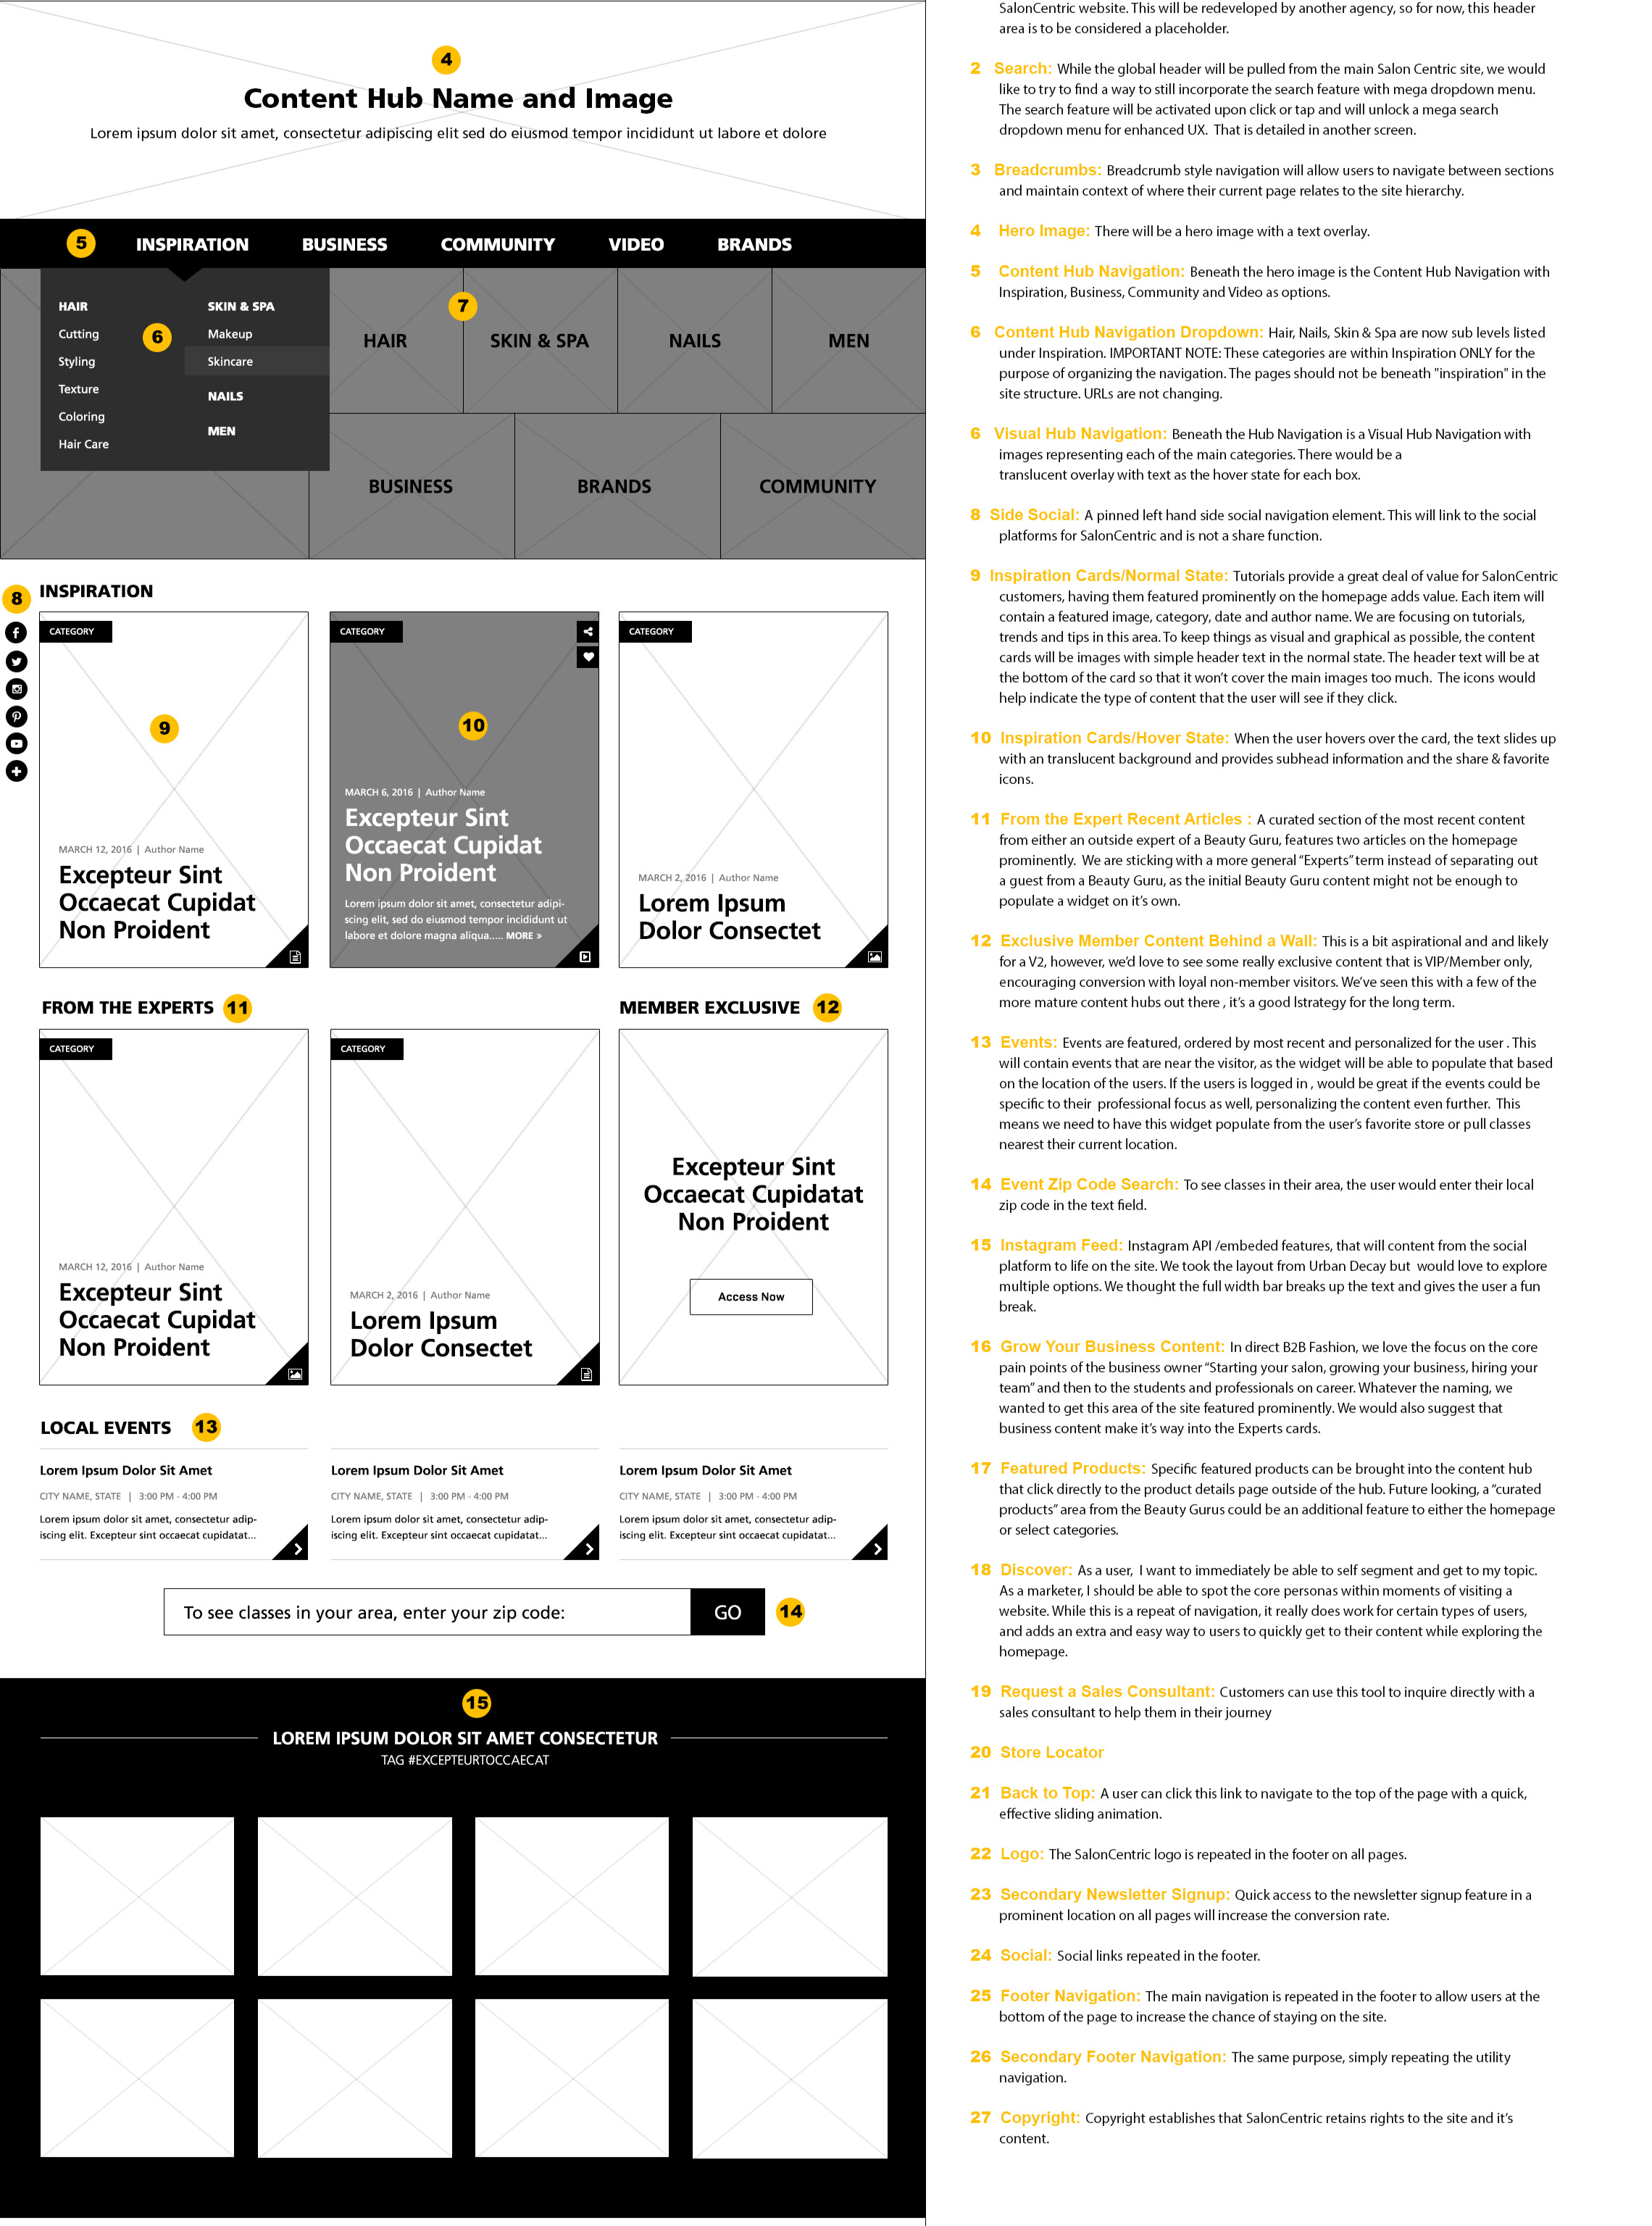 SalonCentric_homepage_v7.jpg